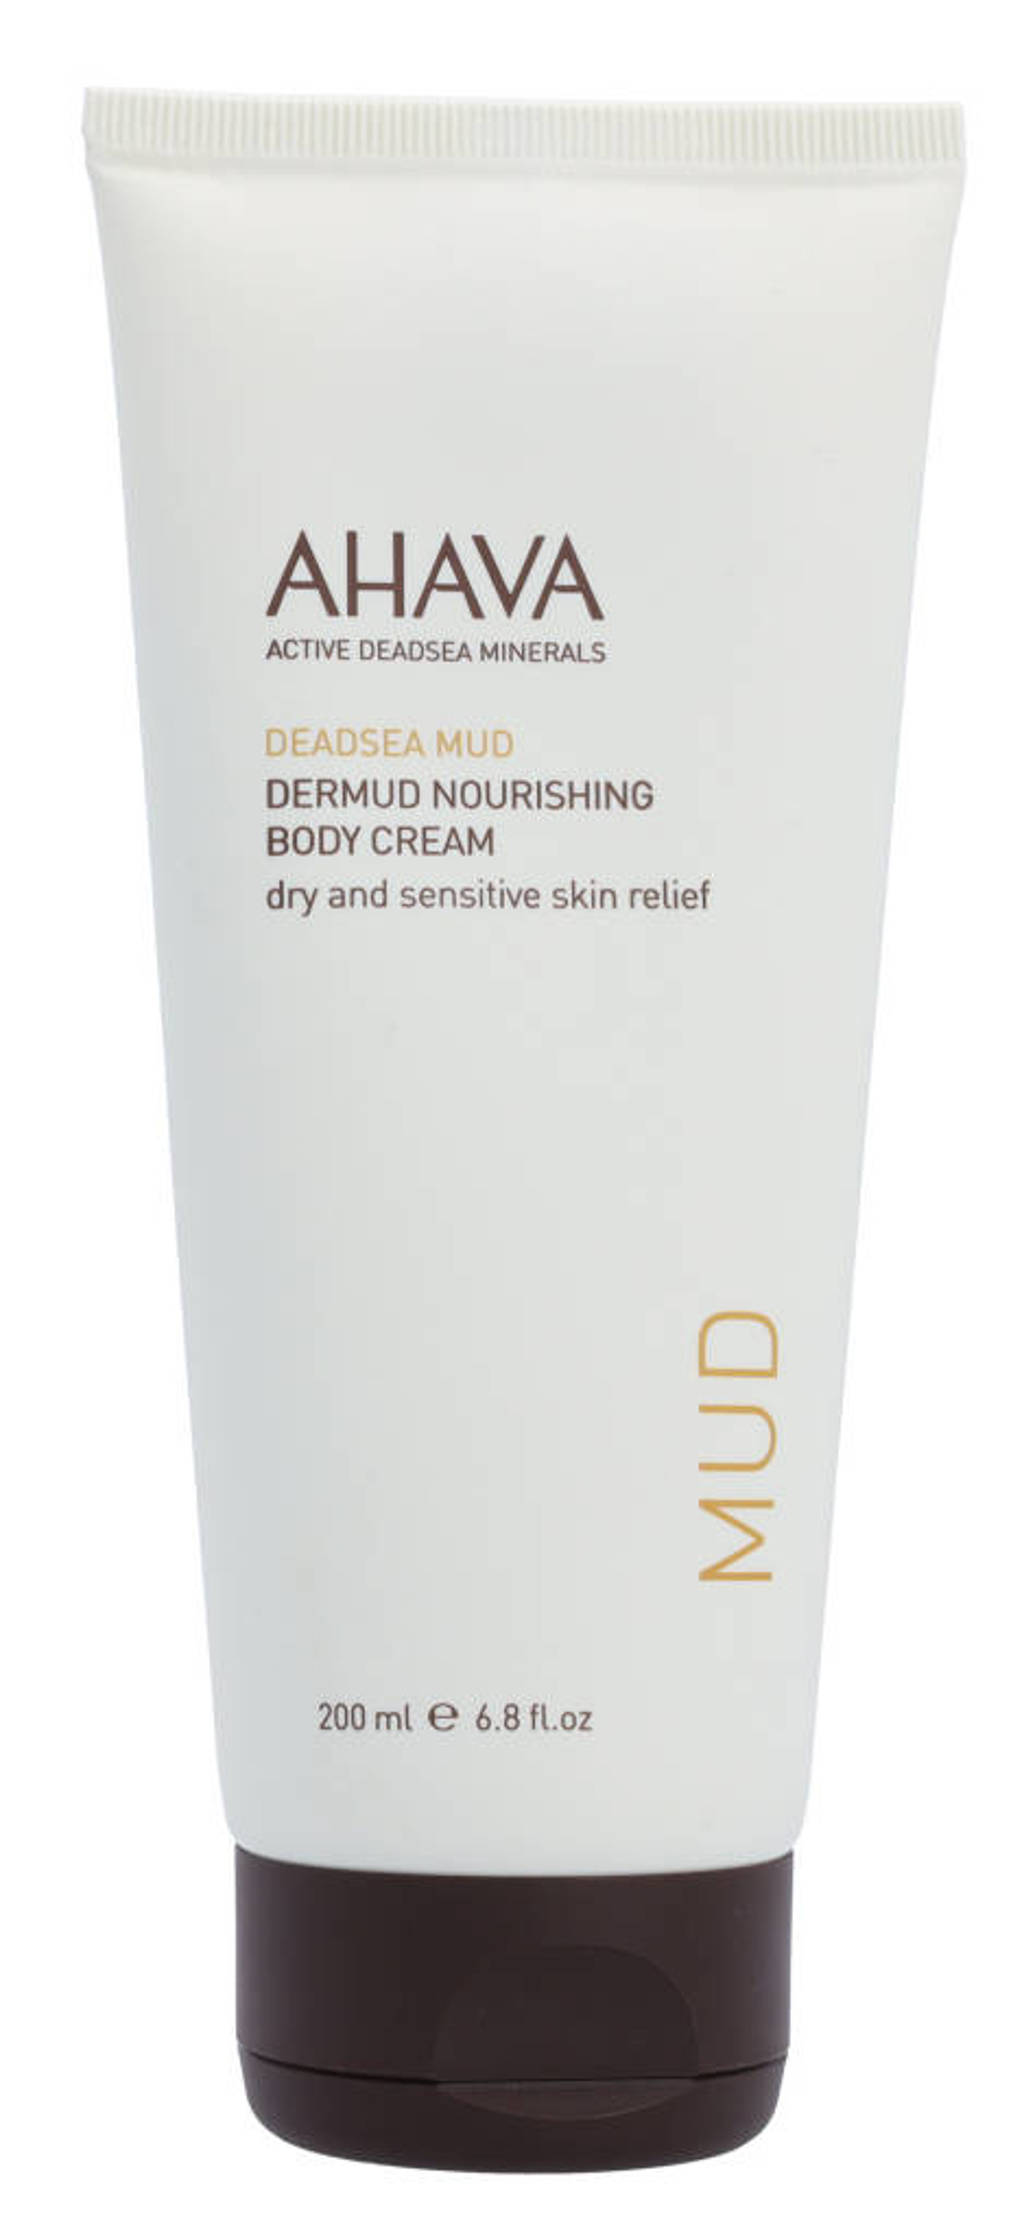 Ahava Deadsea Mud Dermud Nourishing bodycrème